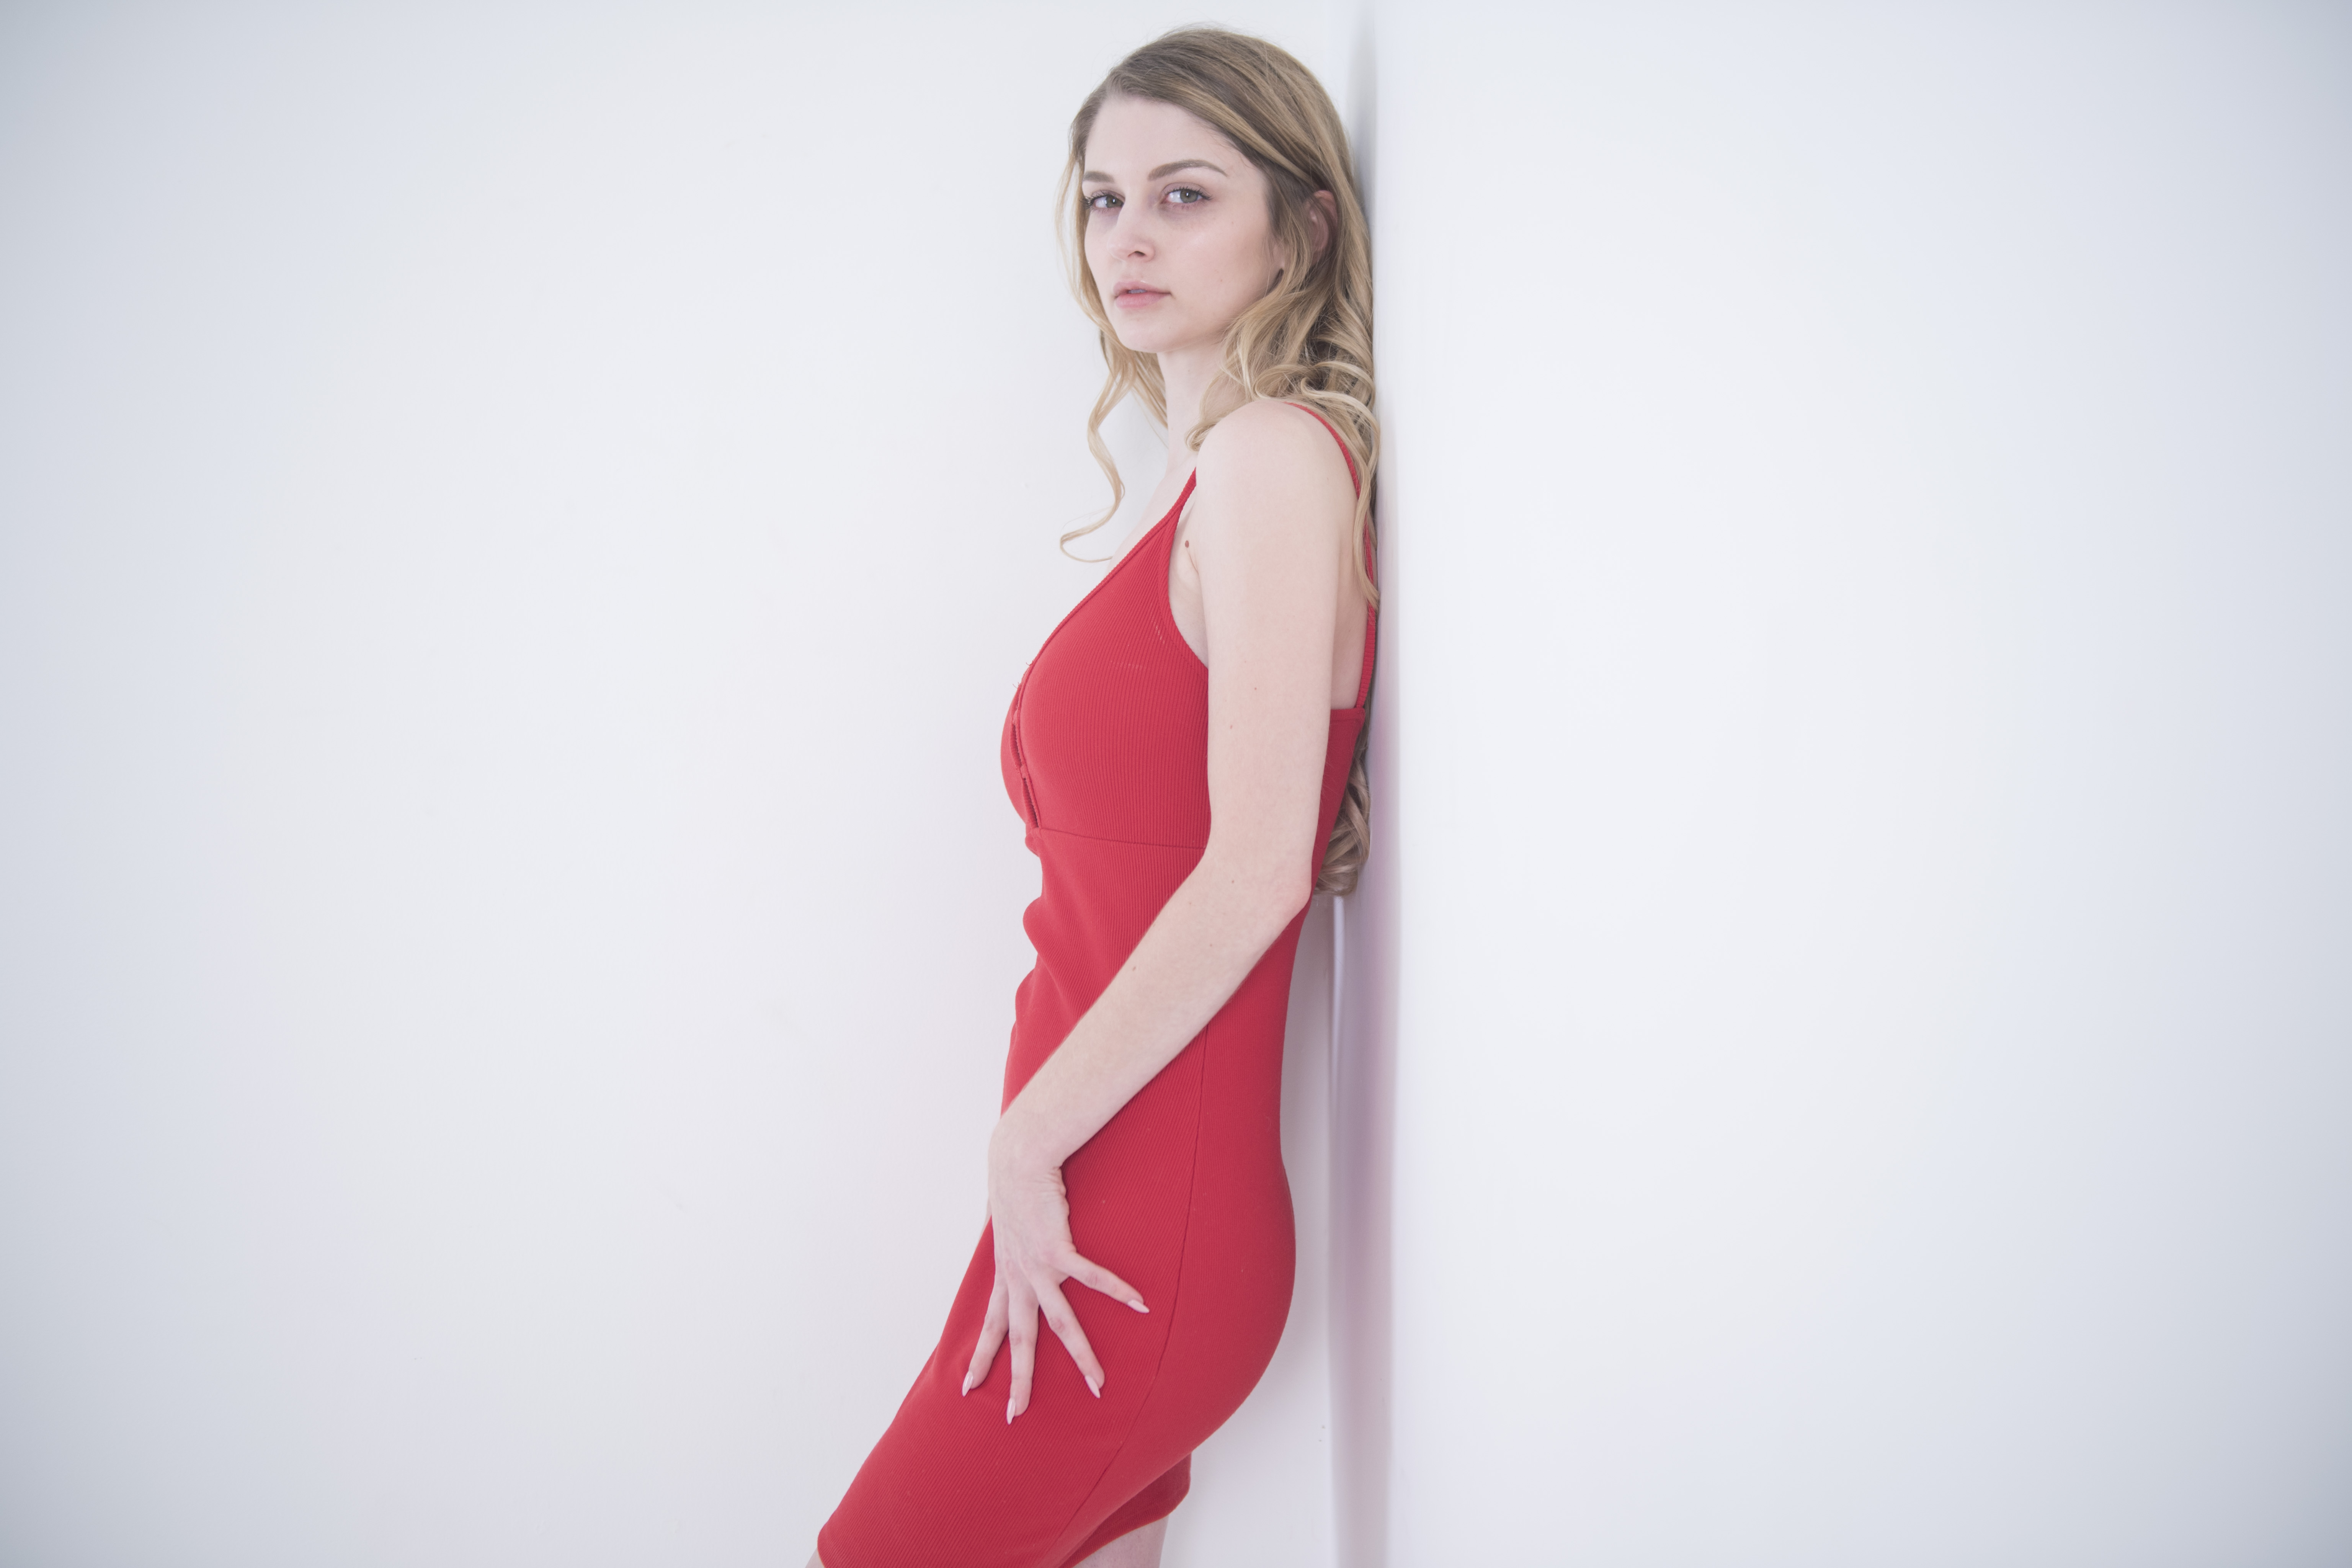 Nadya Navakova, doble airbag - Imágenes en Taringa!